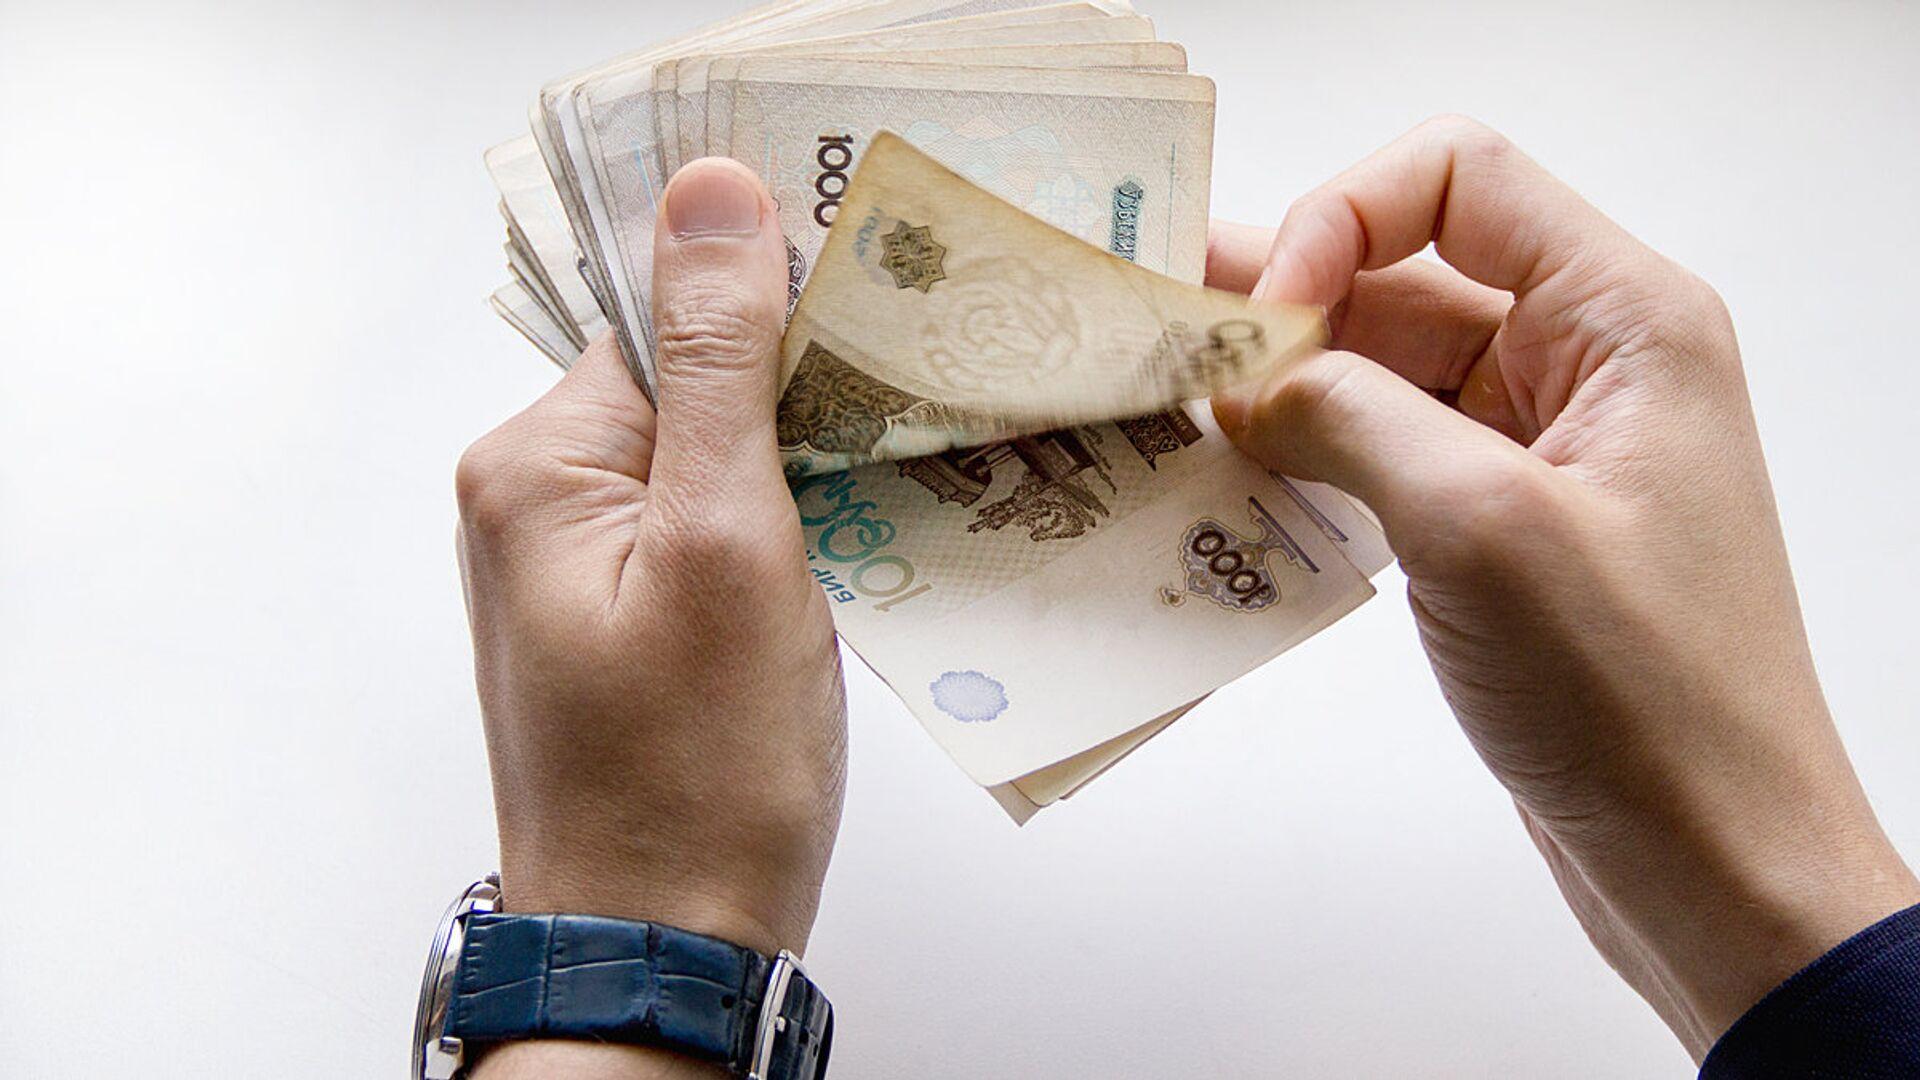 Узбекская валюта - сум  - Sputnik Таджикистан, 1920, 20.08.2021